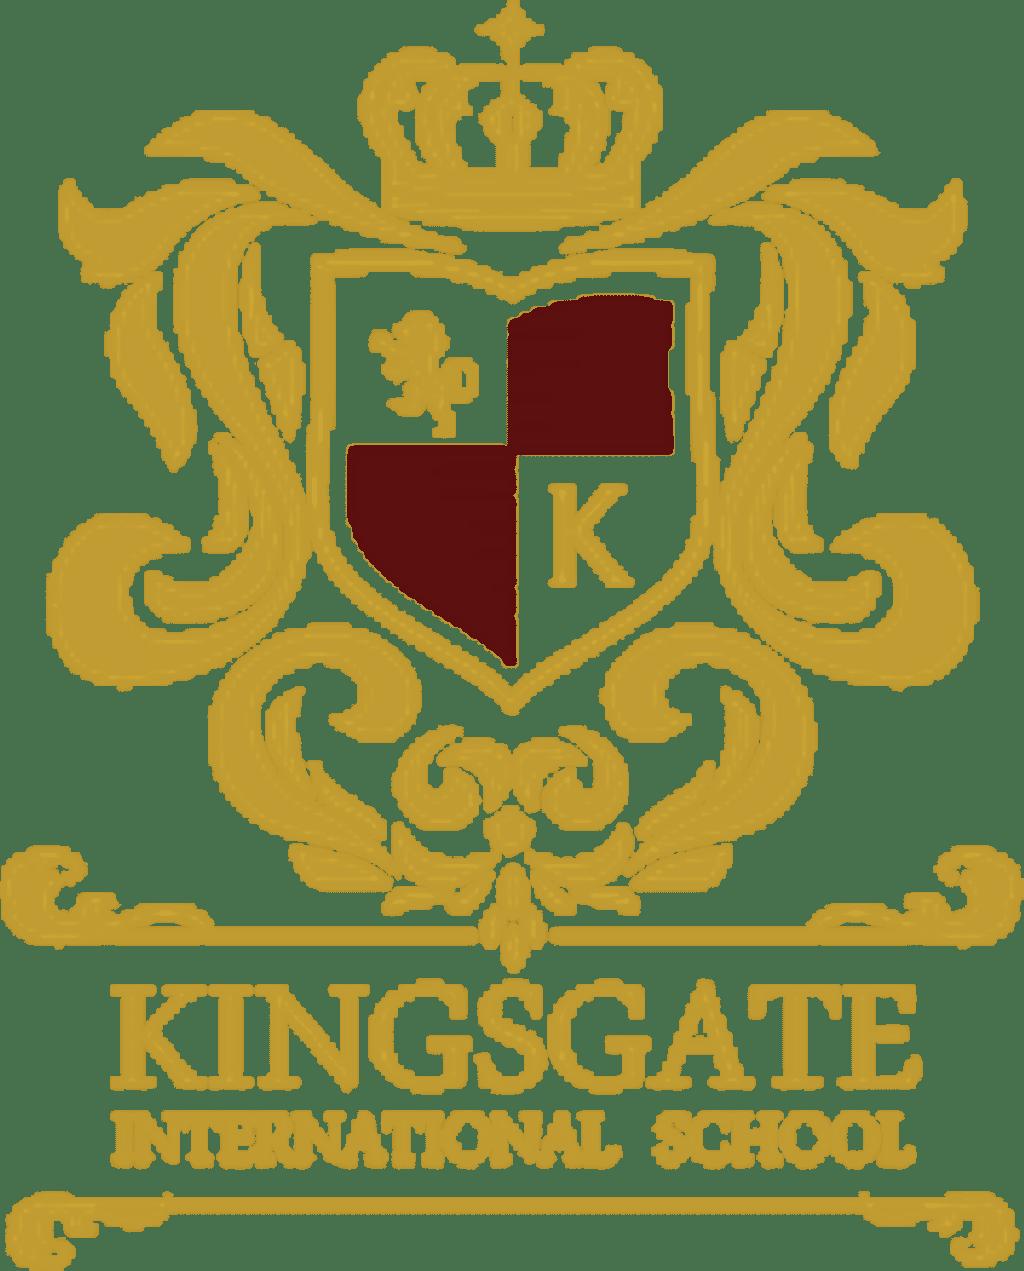 Kingsgate International School is one of the best internatio... via Thomas Shaw